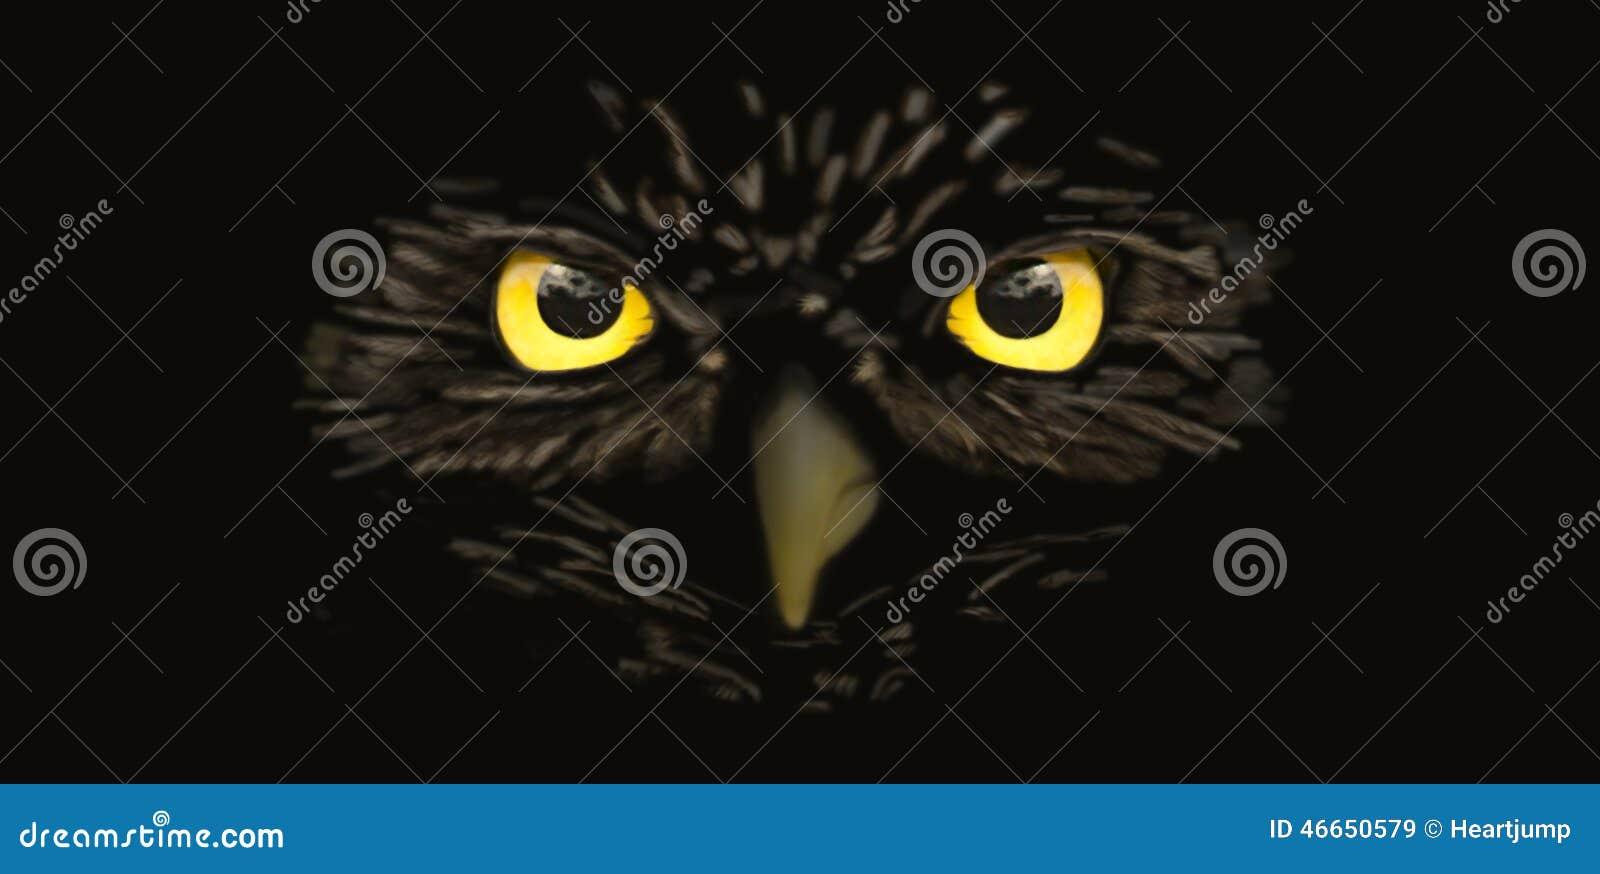 Owl In Black Cartoon Vector | CartoonDealer.com #30825467